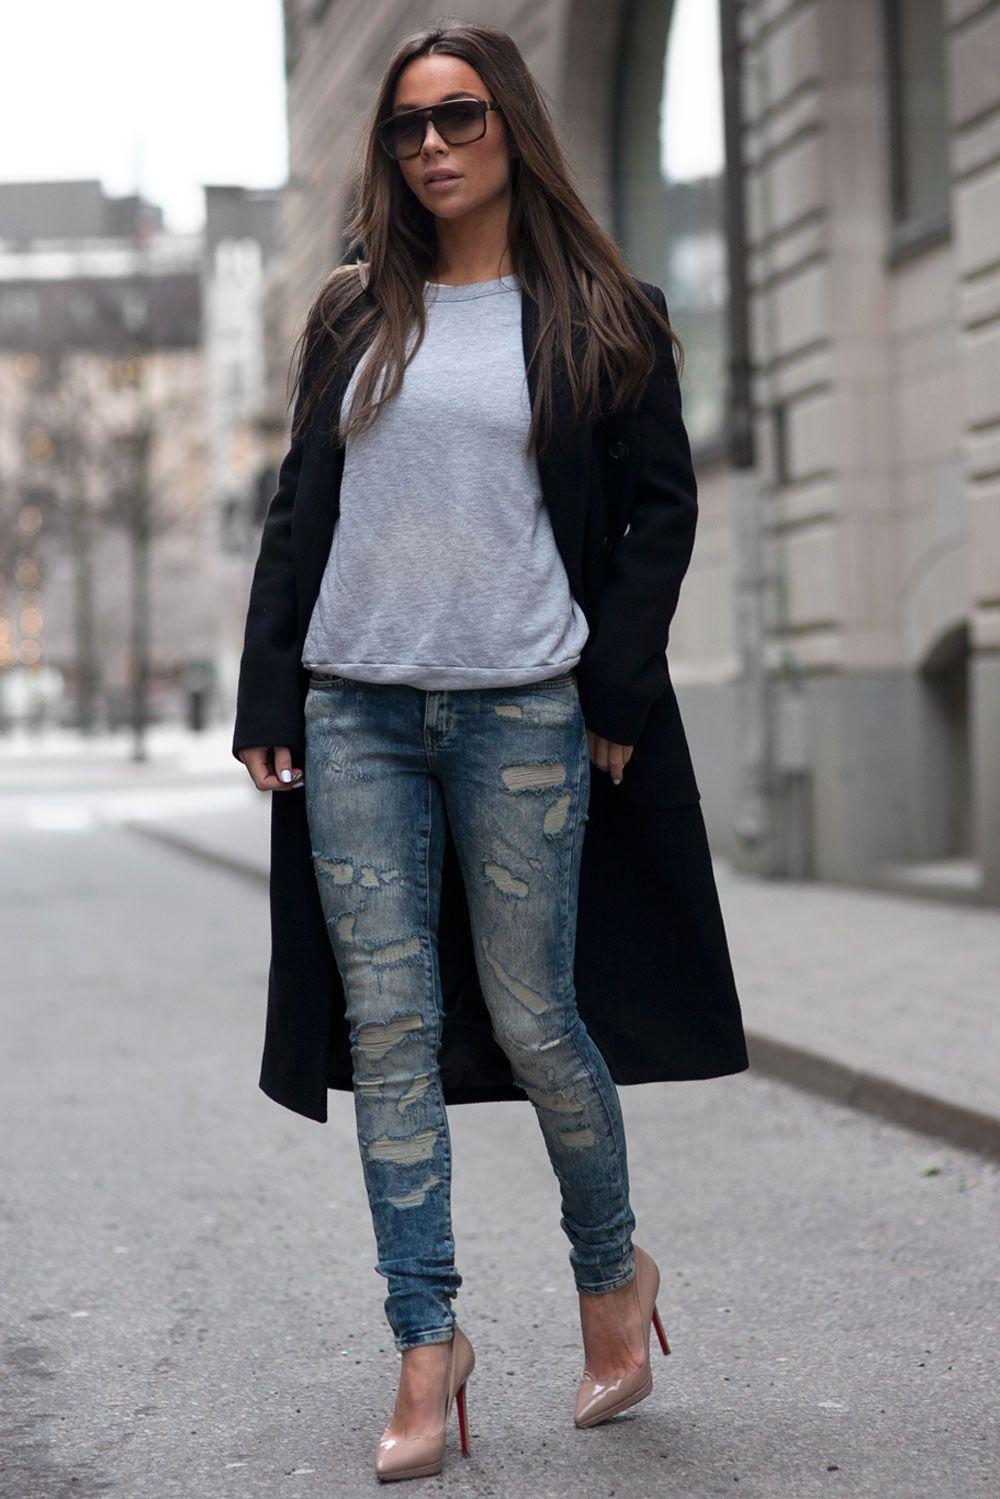 d66596223d952 Johanna Olsson swedish fashionbloger | coats | Streetwear fashion ...